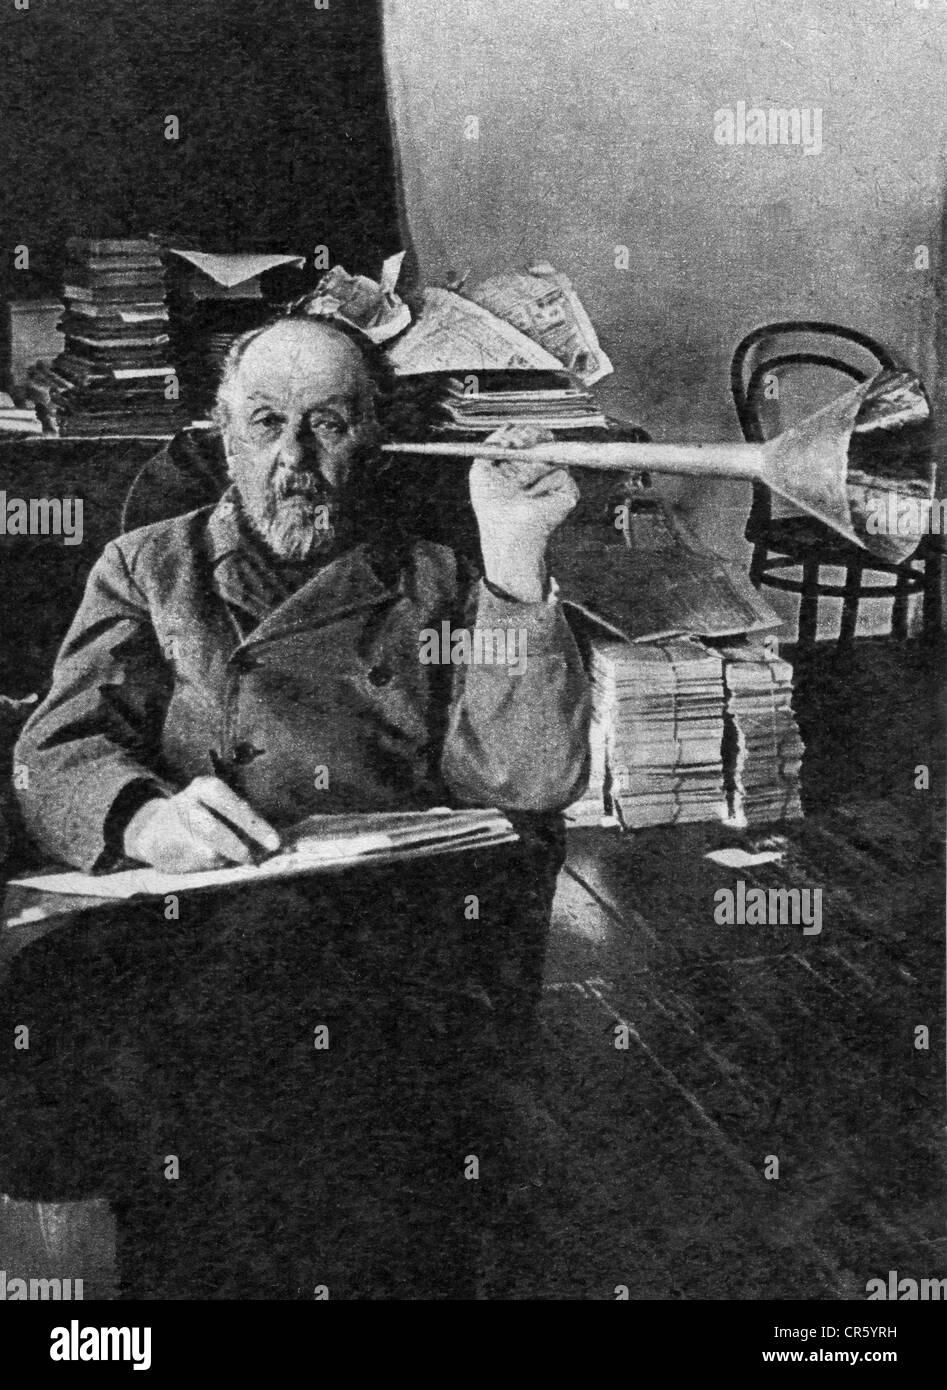 Tsiolkovskii, Konstantin Eduardovich, 17.9.1857 - 19.9.1935, russischer Physiker, Mathematikhistoriker, Pionier Stockfoto